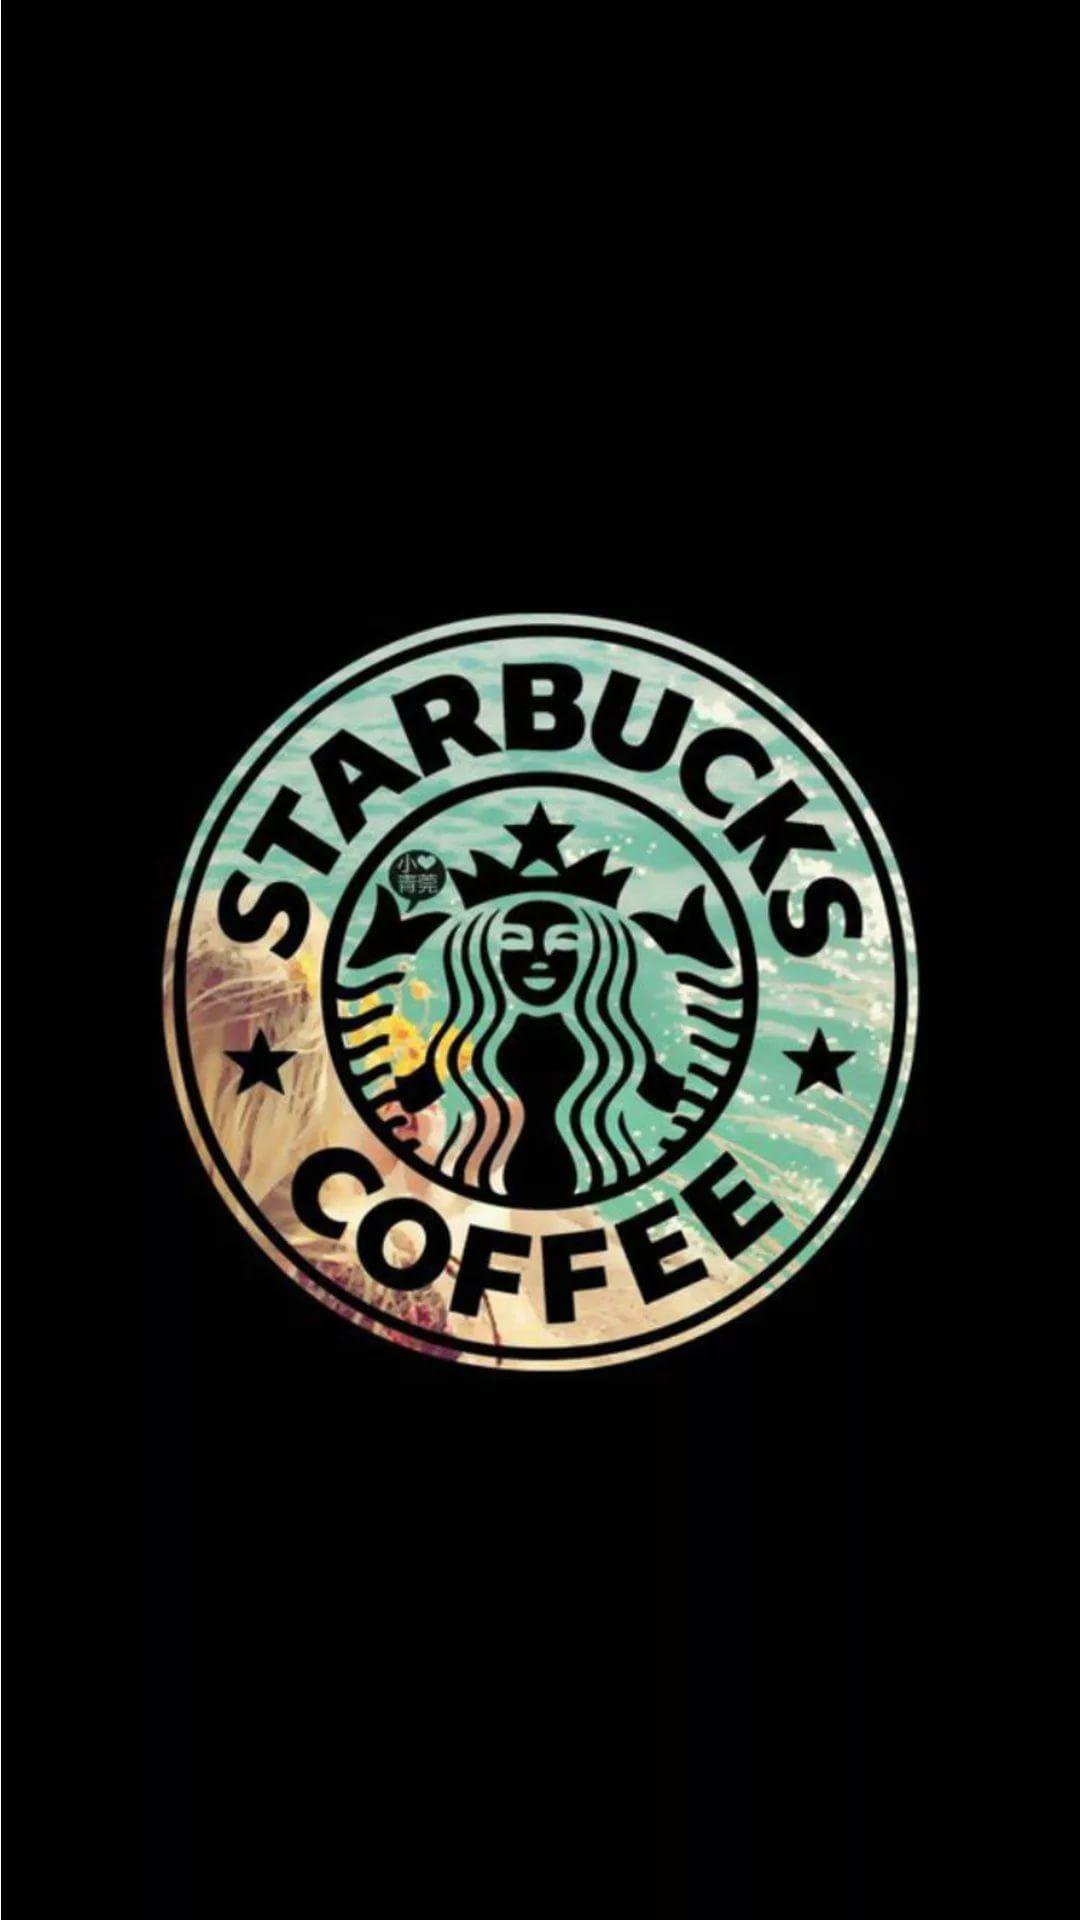 Starbucks iPhone wallpaper size